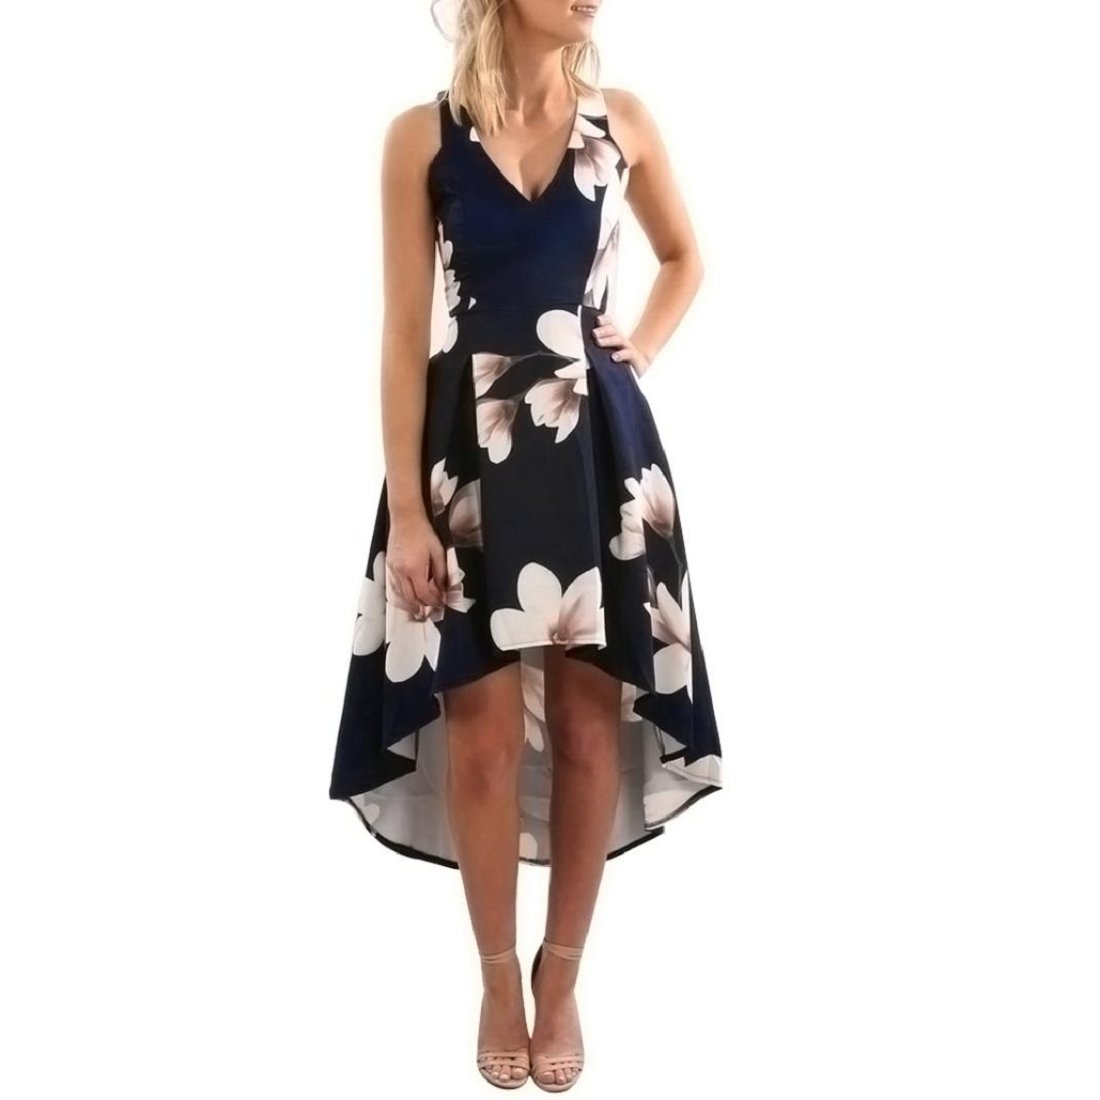 GONKOMA Womens Floral Print Long Dress Summer Boho Maxi Dress Beach Sundress XWJ520